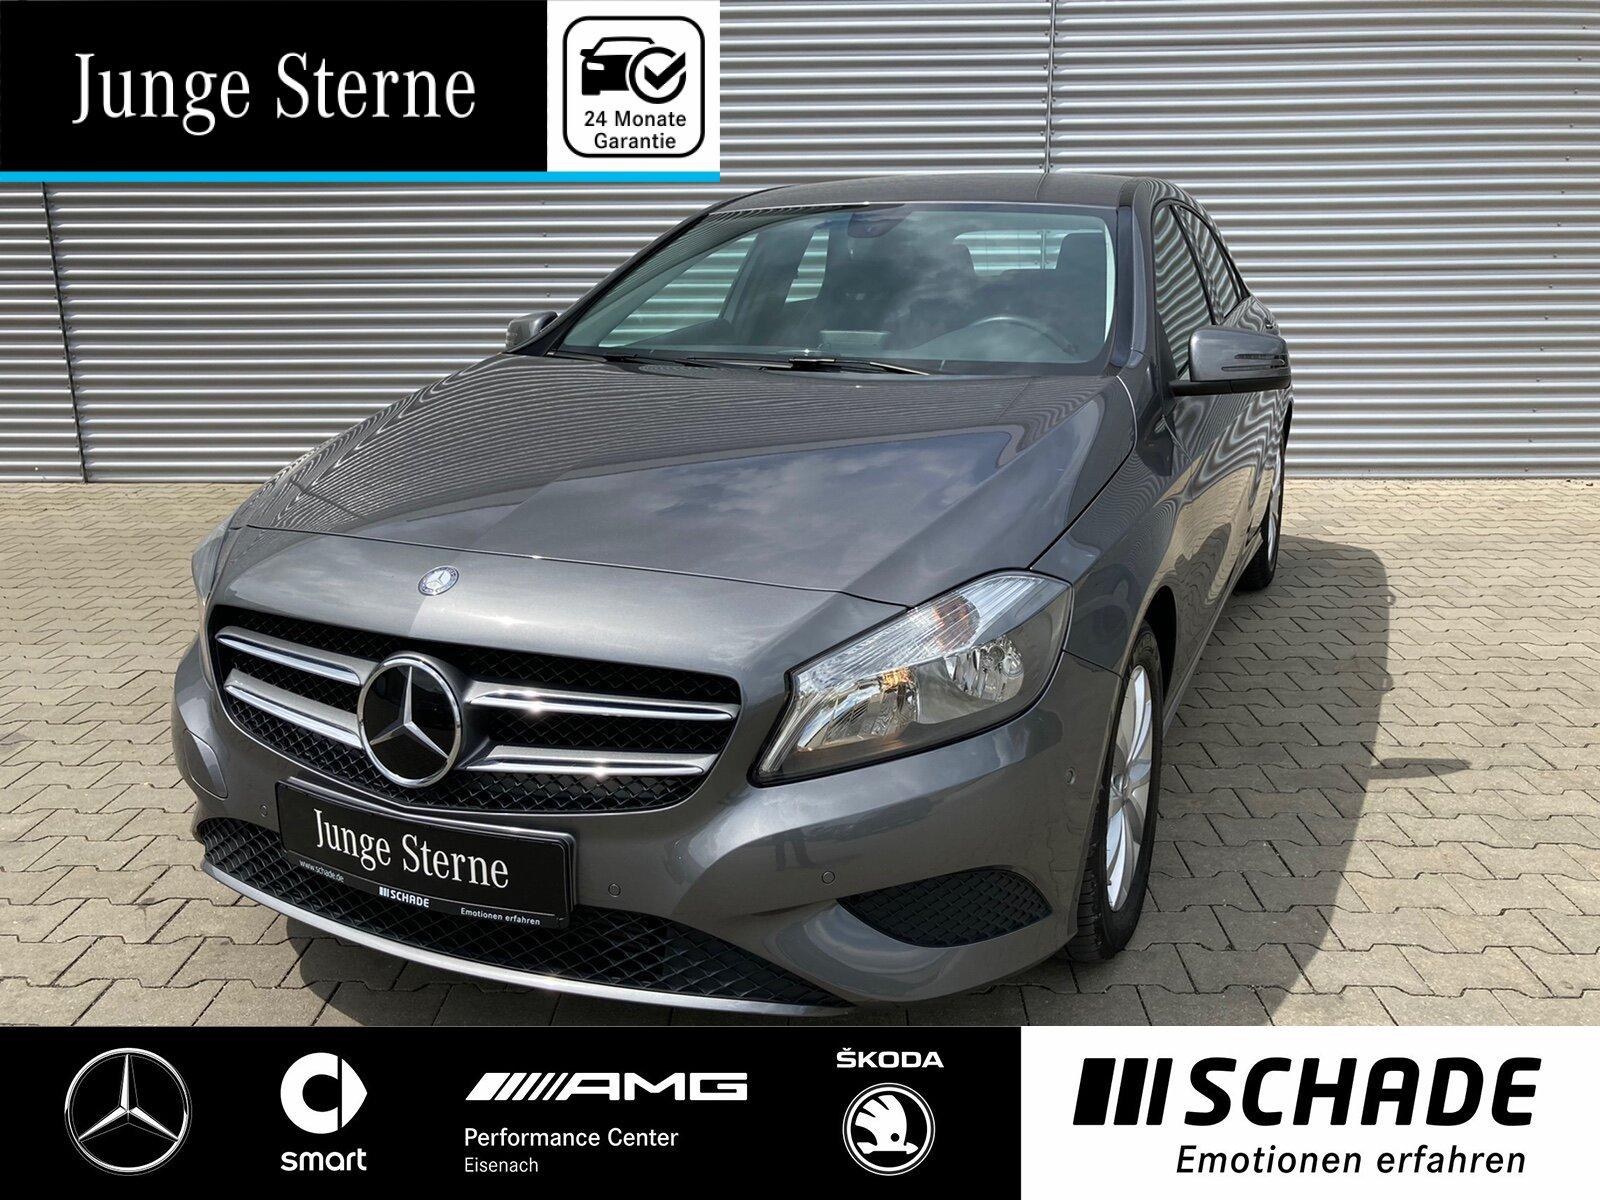 Mercedes-Benz A 200 Style Navi*Sitzheizung*Park-Assi*Tempomat, Jahr 2015, Benzin